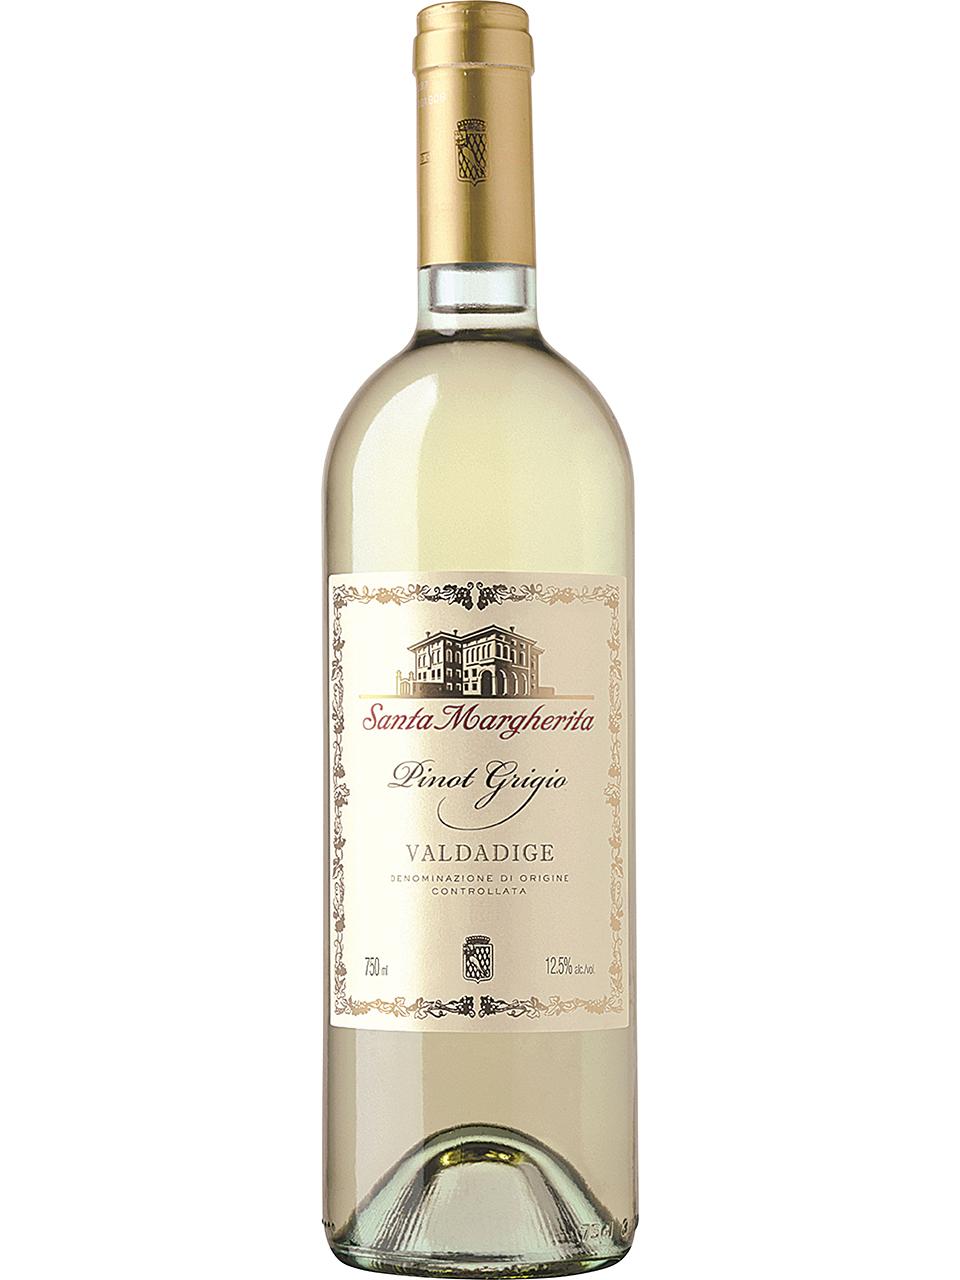 Santa Margherita Valdadige Pinot Grigio DOC